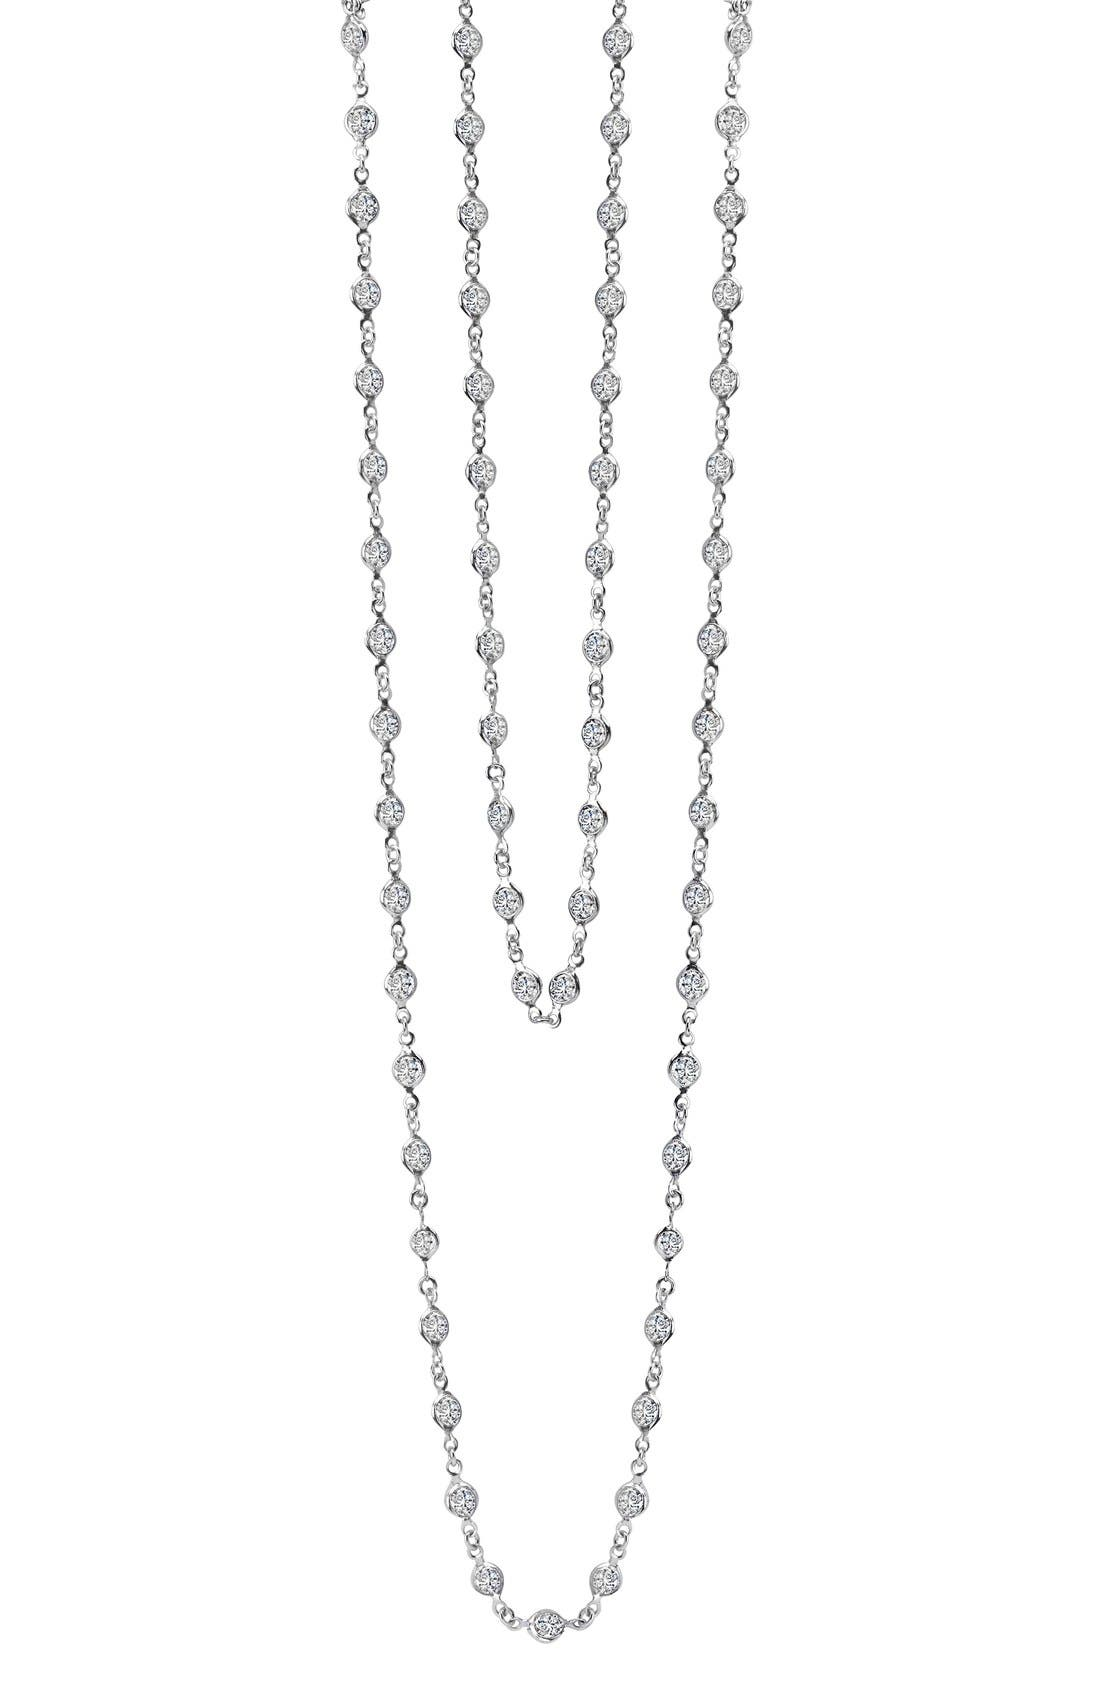 Lafonn Multistrand Necklace